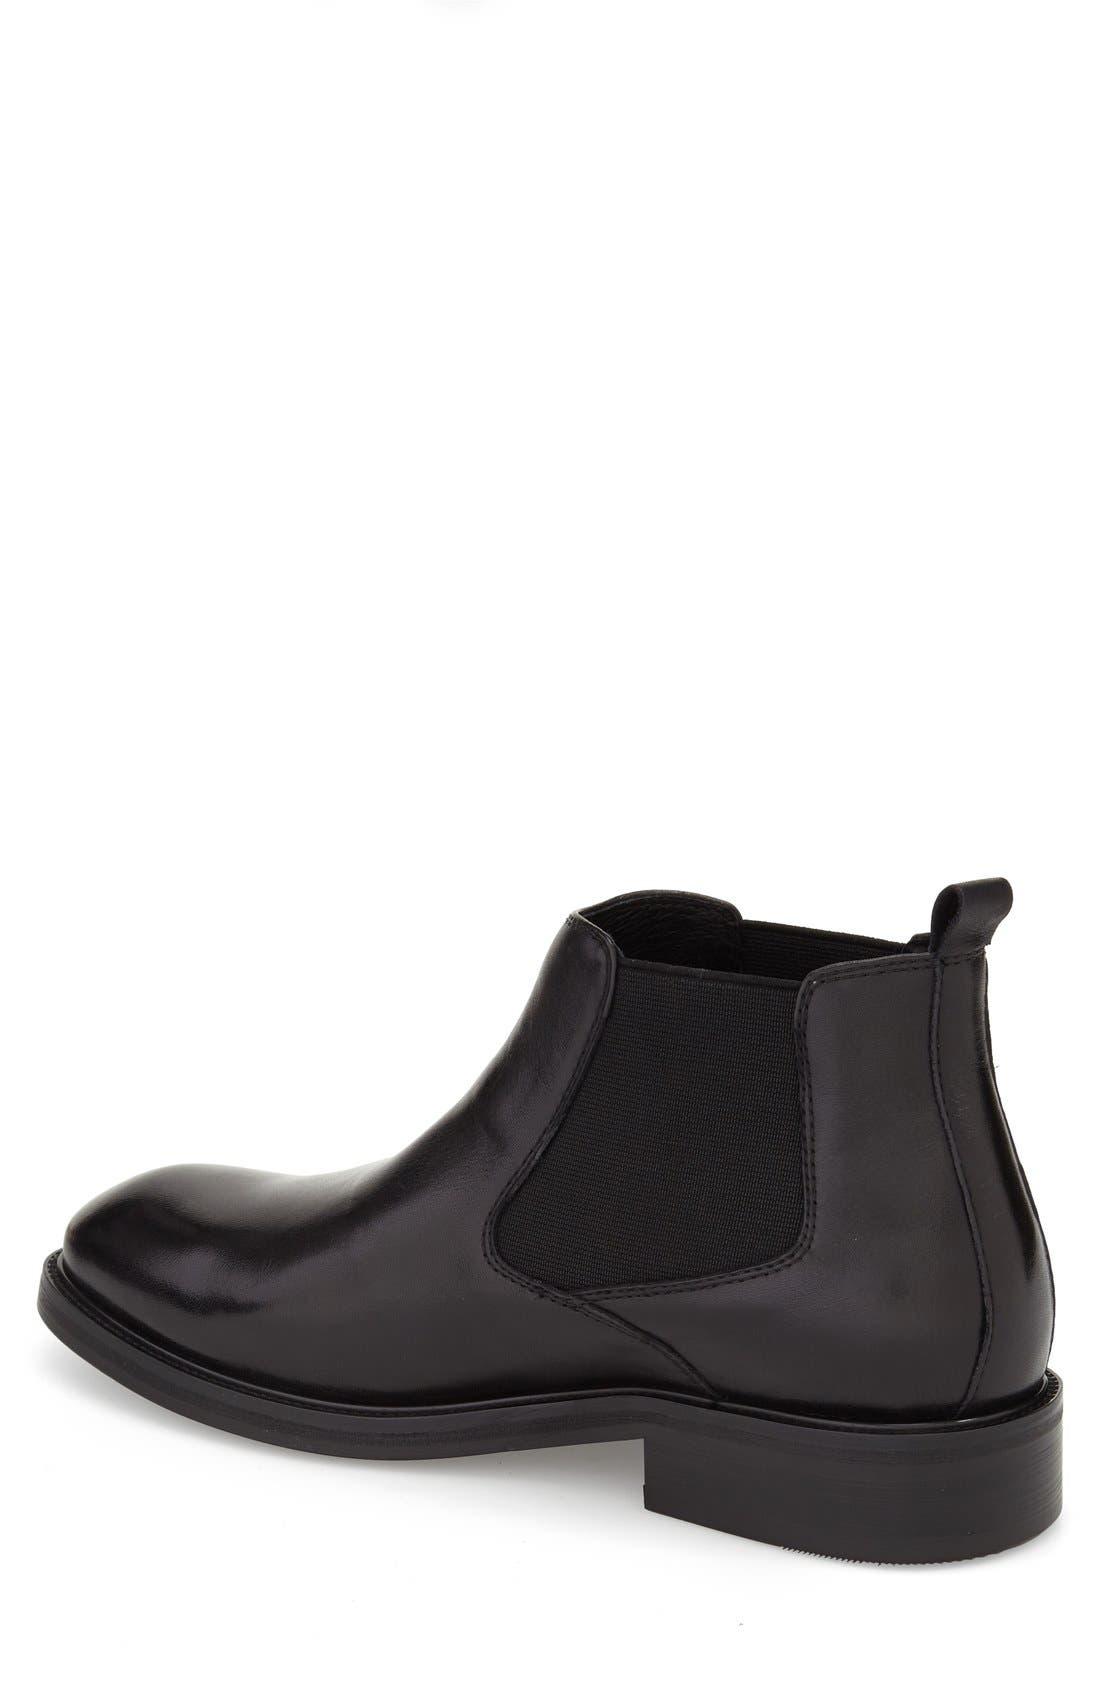 'Napoli' Double Monk Strap Shoe,                             Alternate thumbnail 3, color,                             001